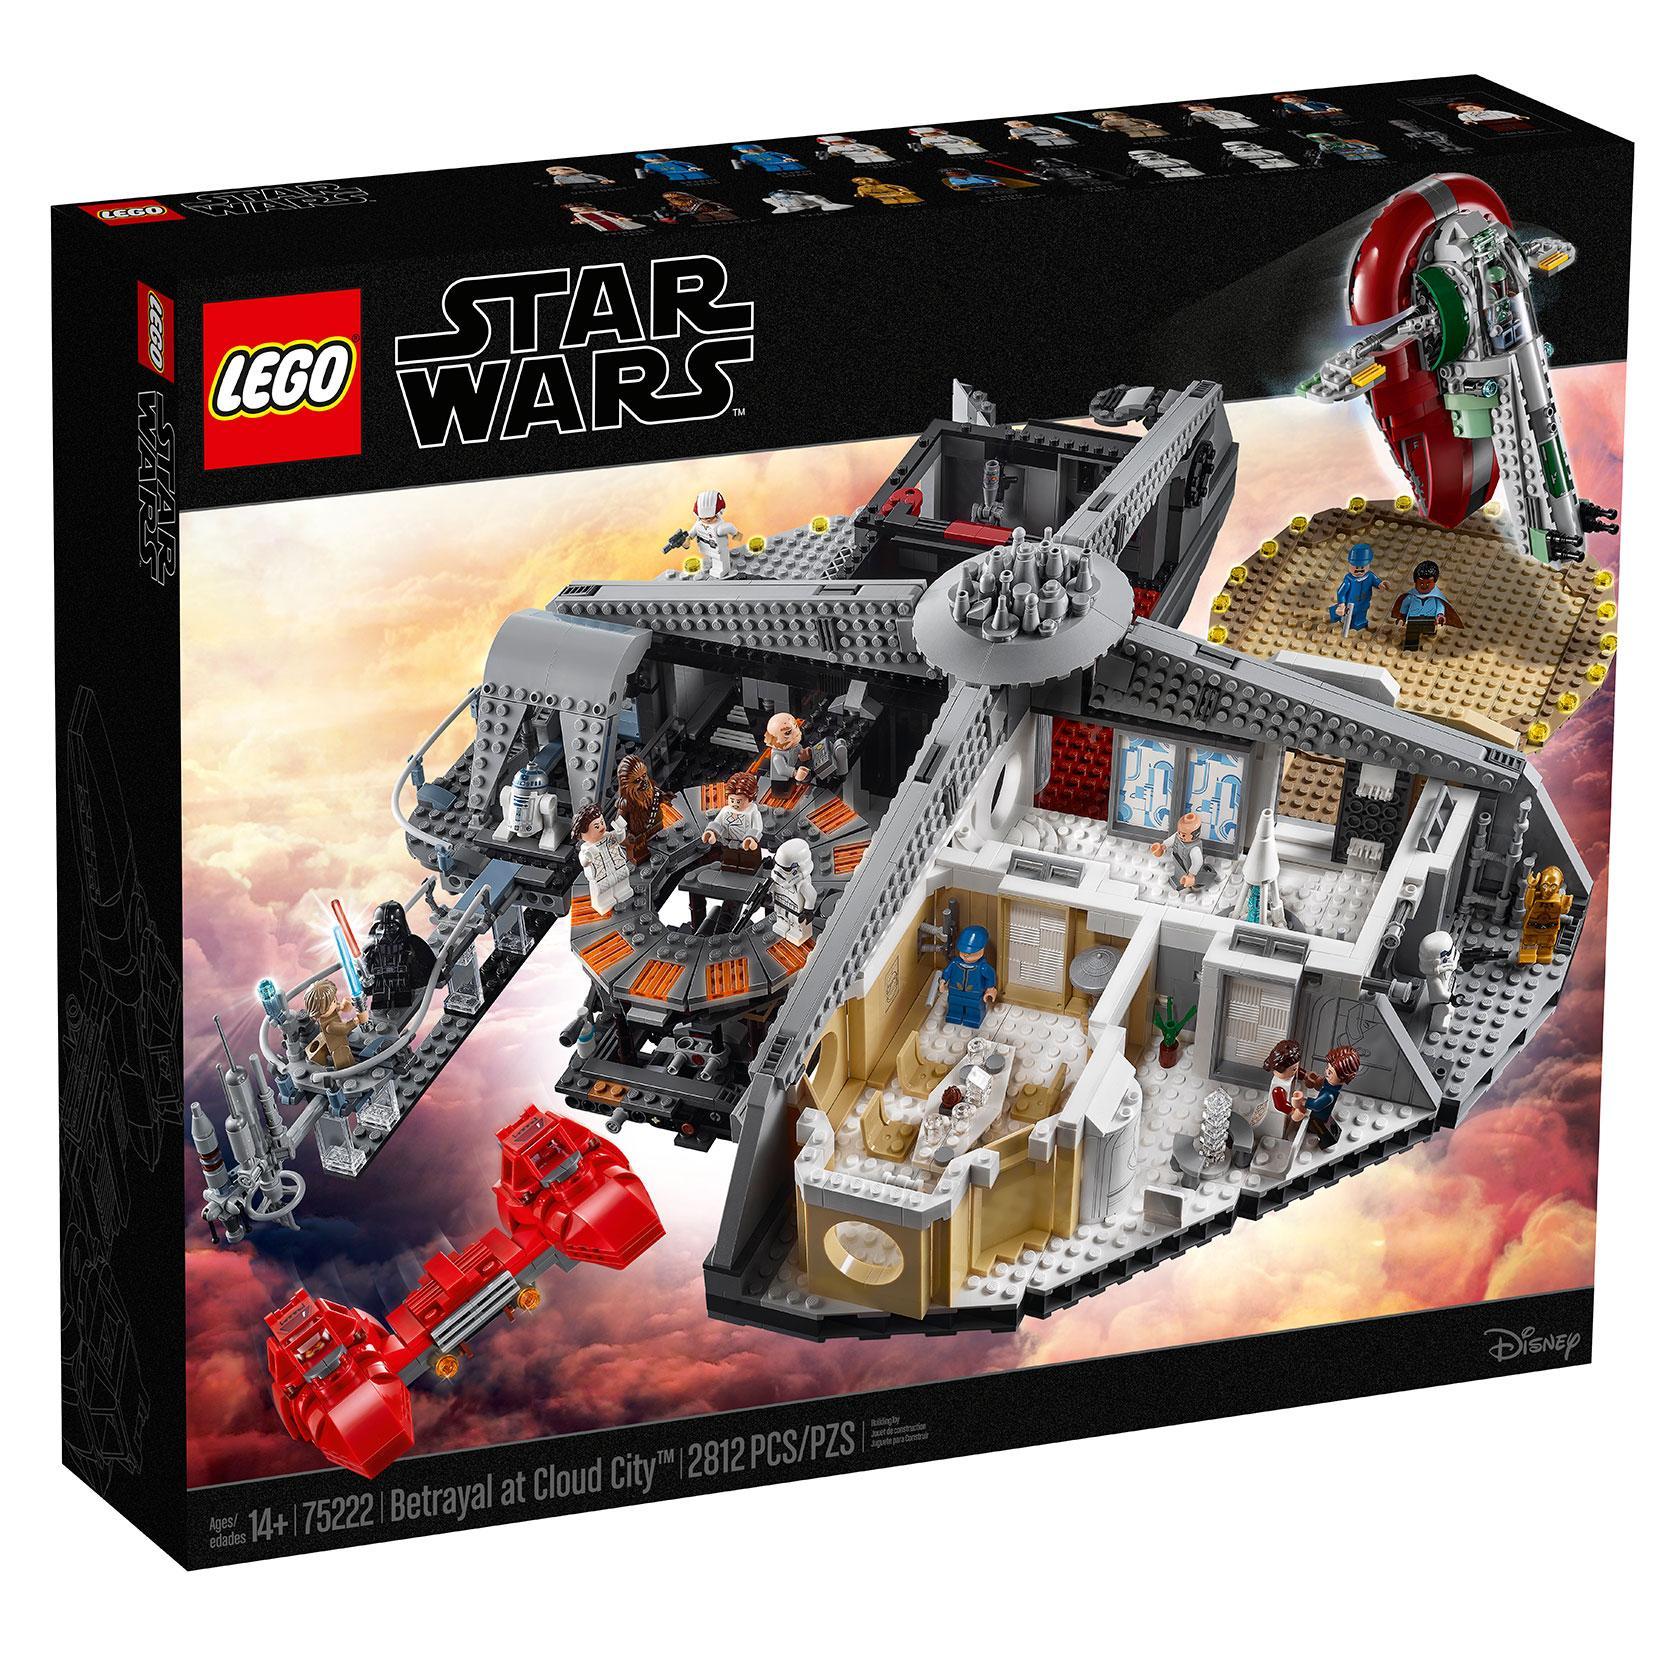 LEGO Star Wars Cloud City: Why this one's unique - SlashGear